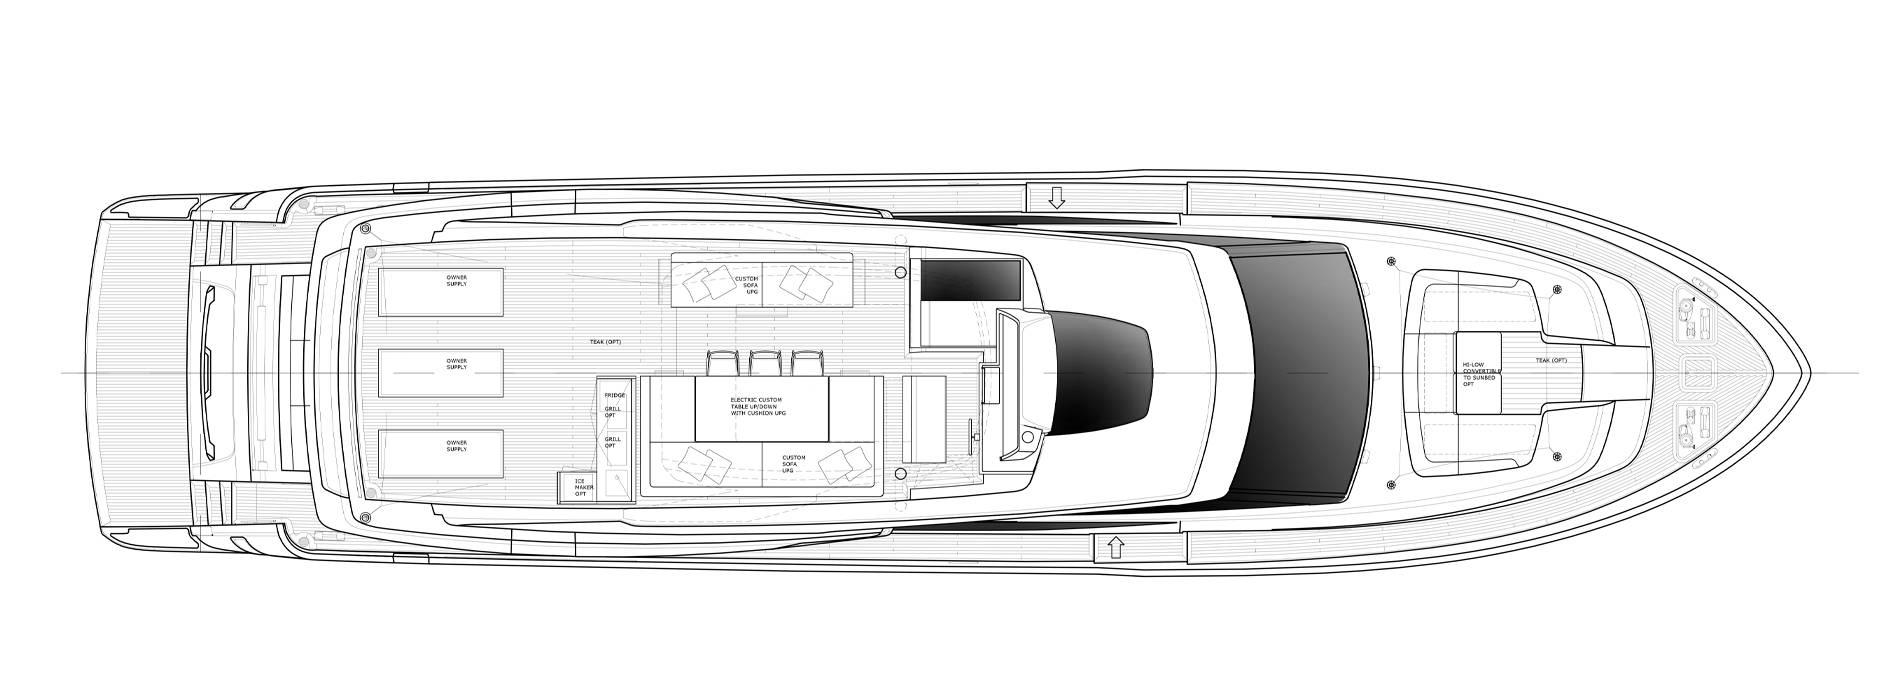 Sanlorenzo Yachts SL86-727 Flying bridge